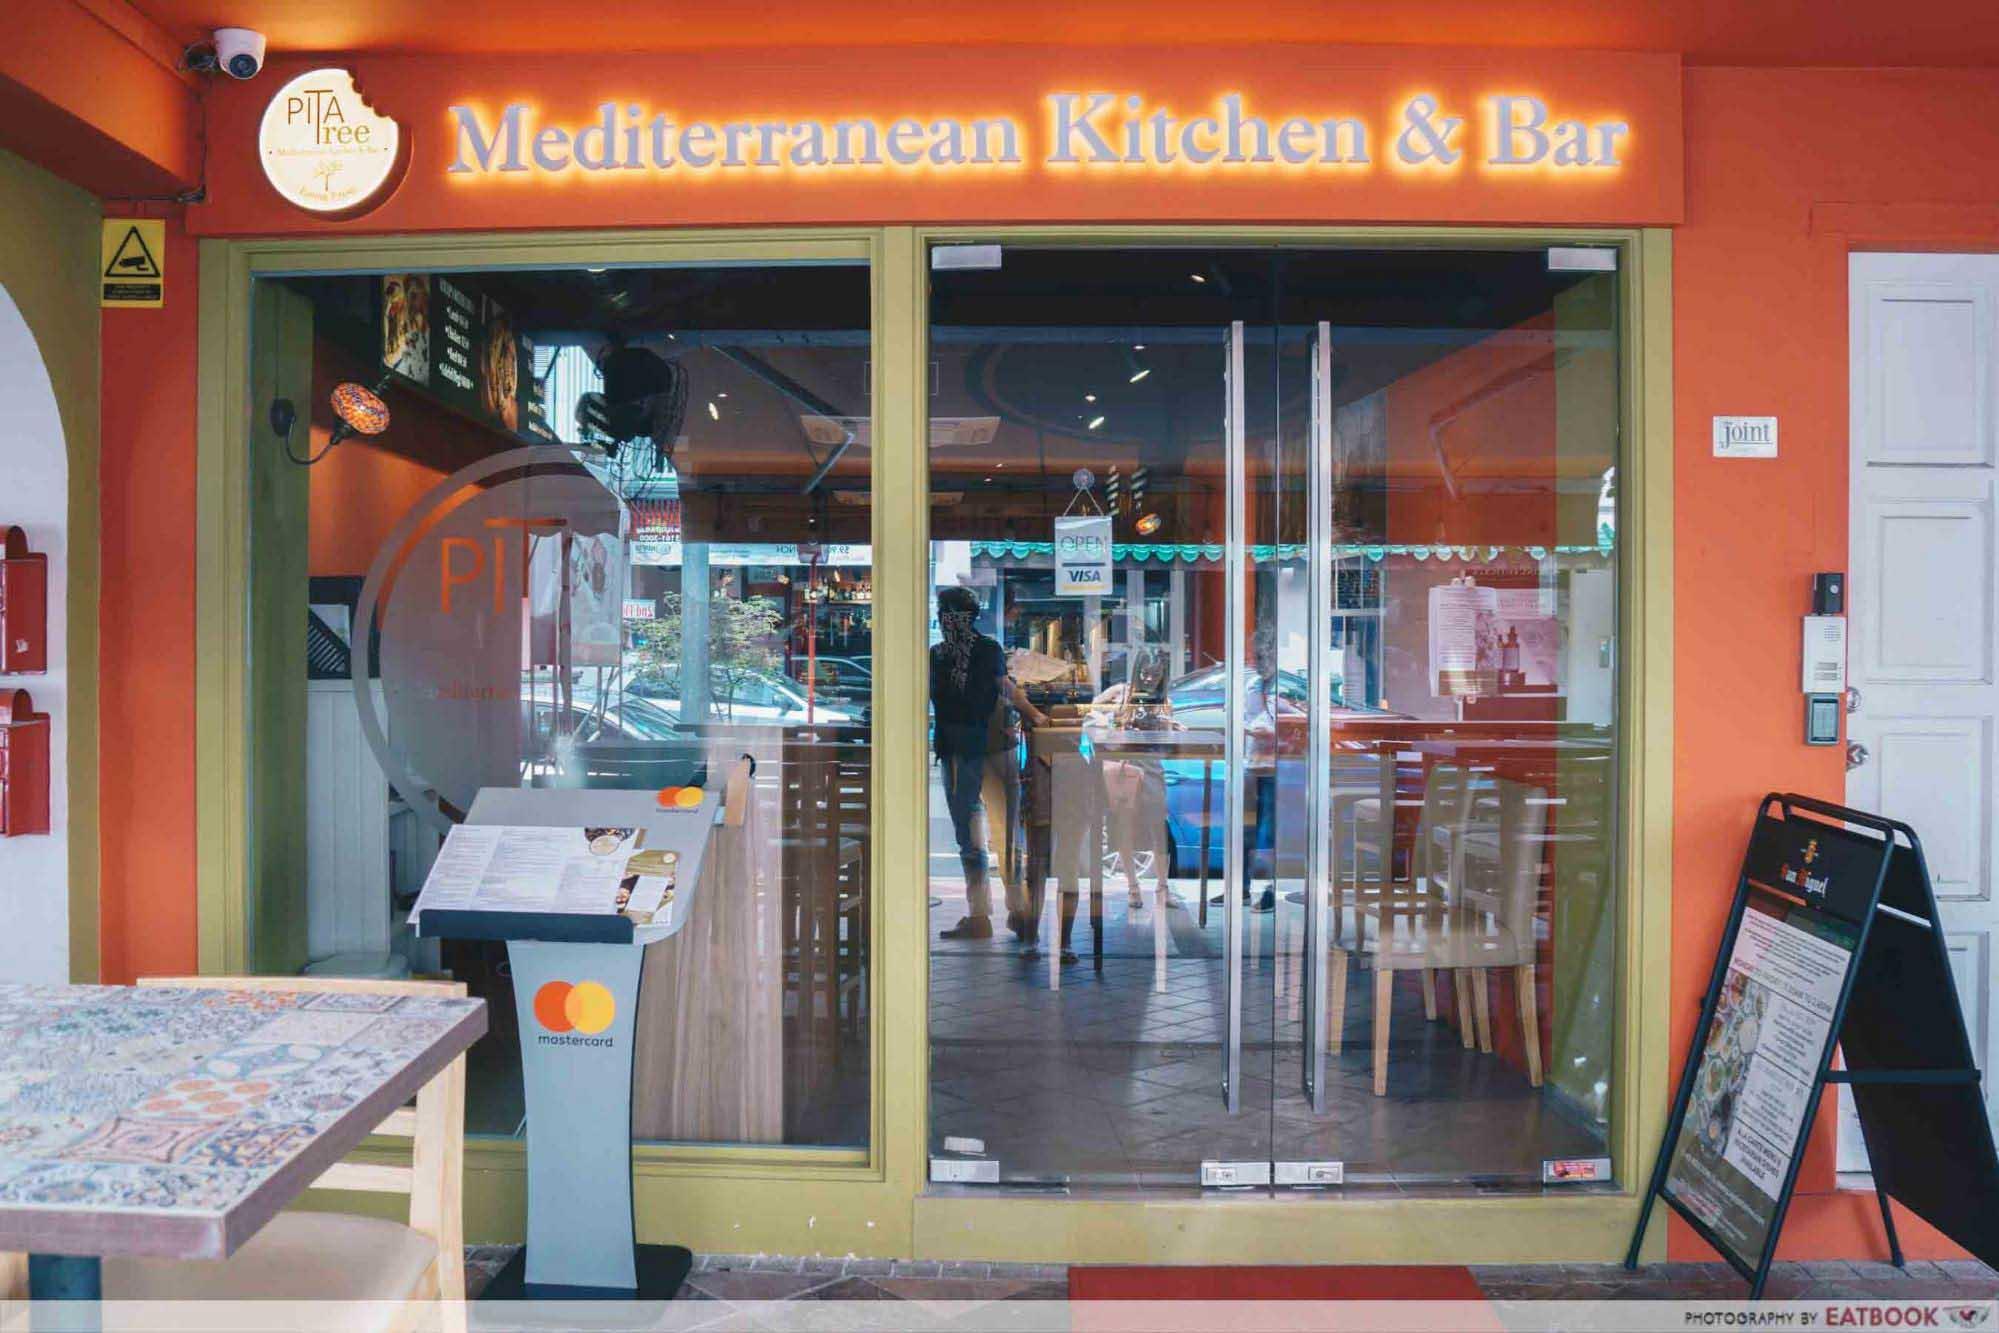 New Restaurants September 2018 - Pita Tree Strorefront